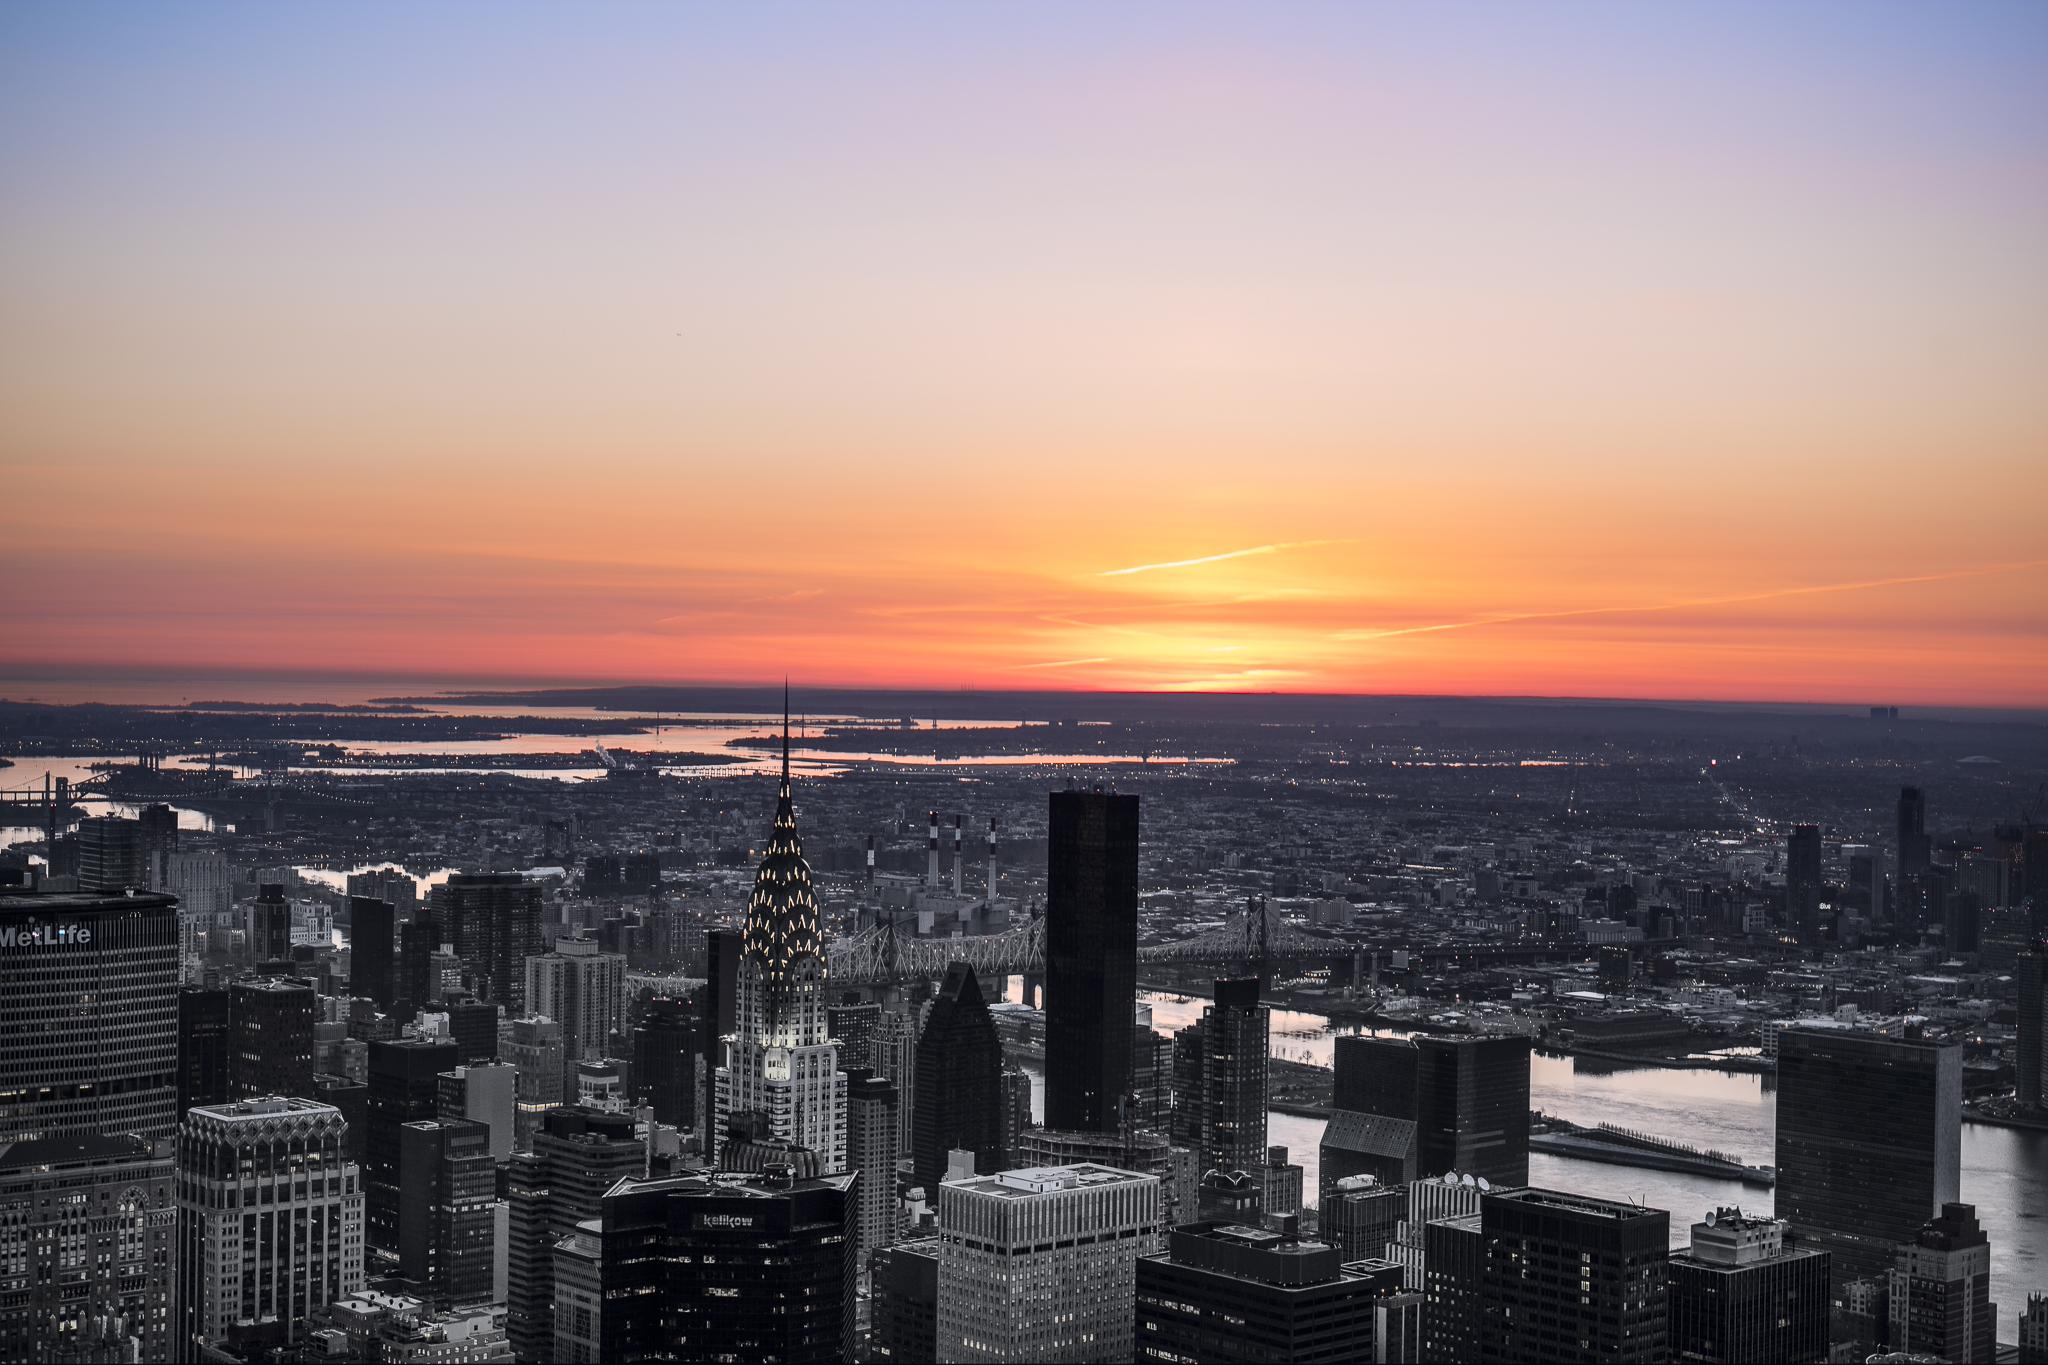 New York, 06:07AM